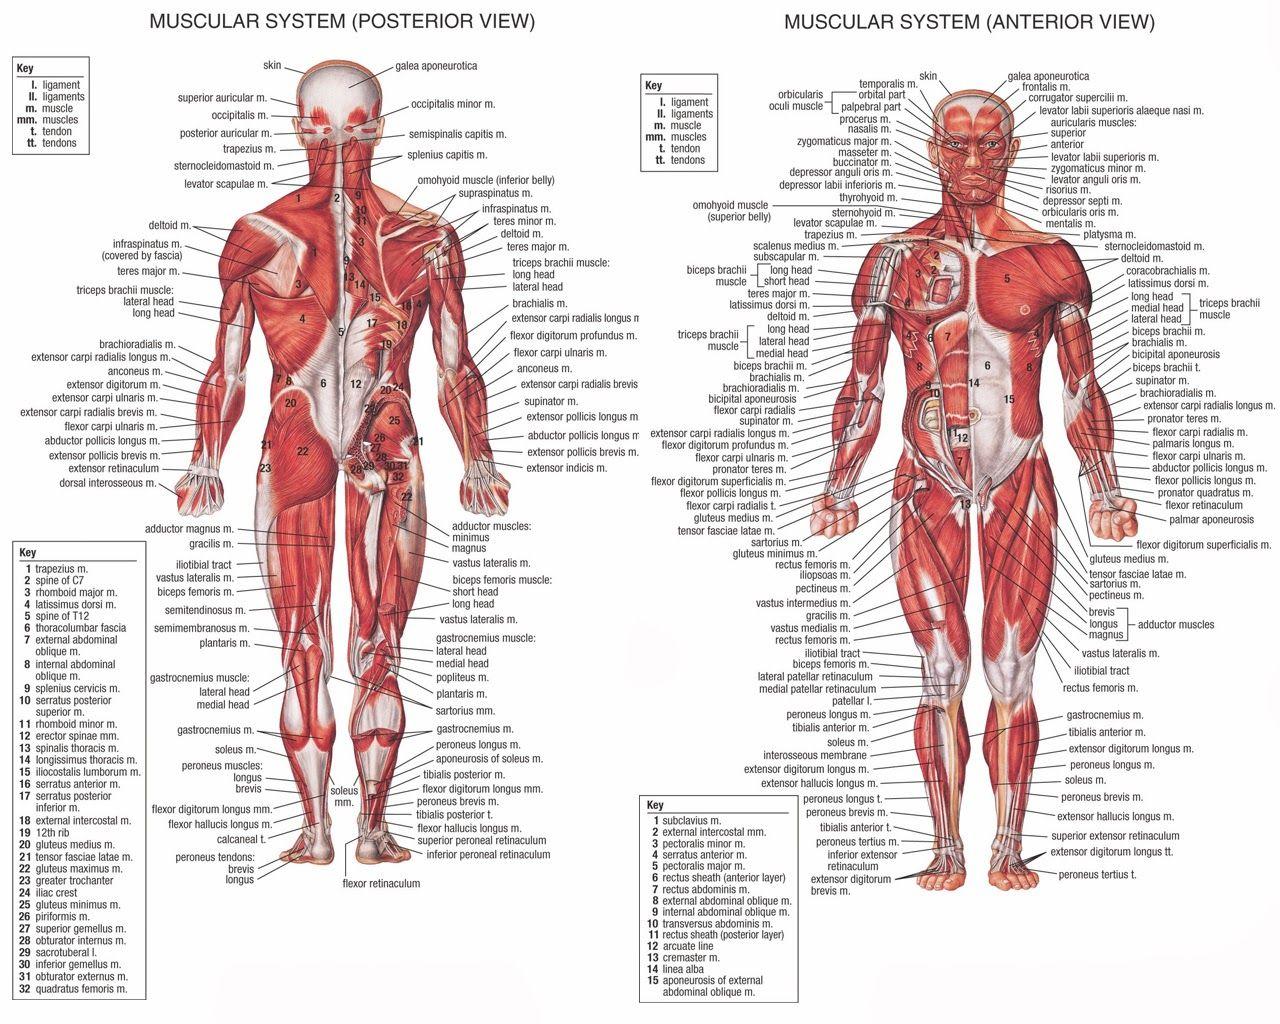 Human Body Systems Chart Key Human Body Muscles Chart The ...